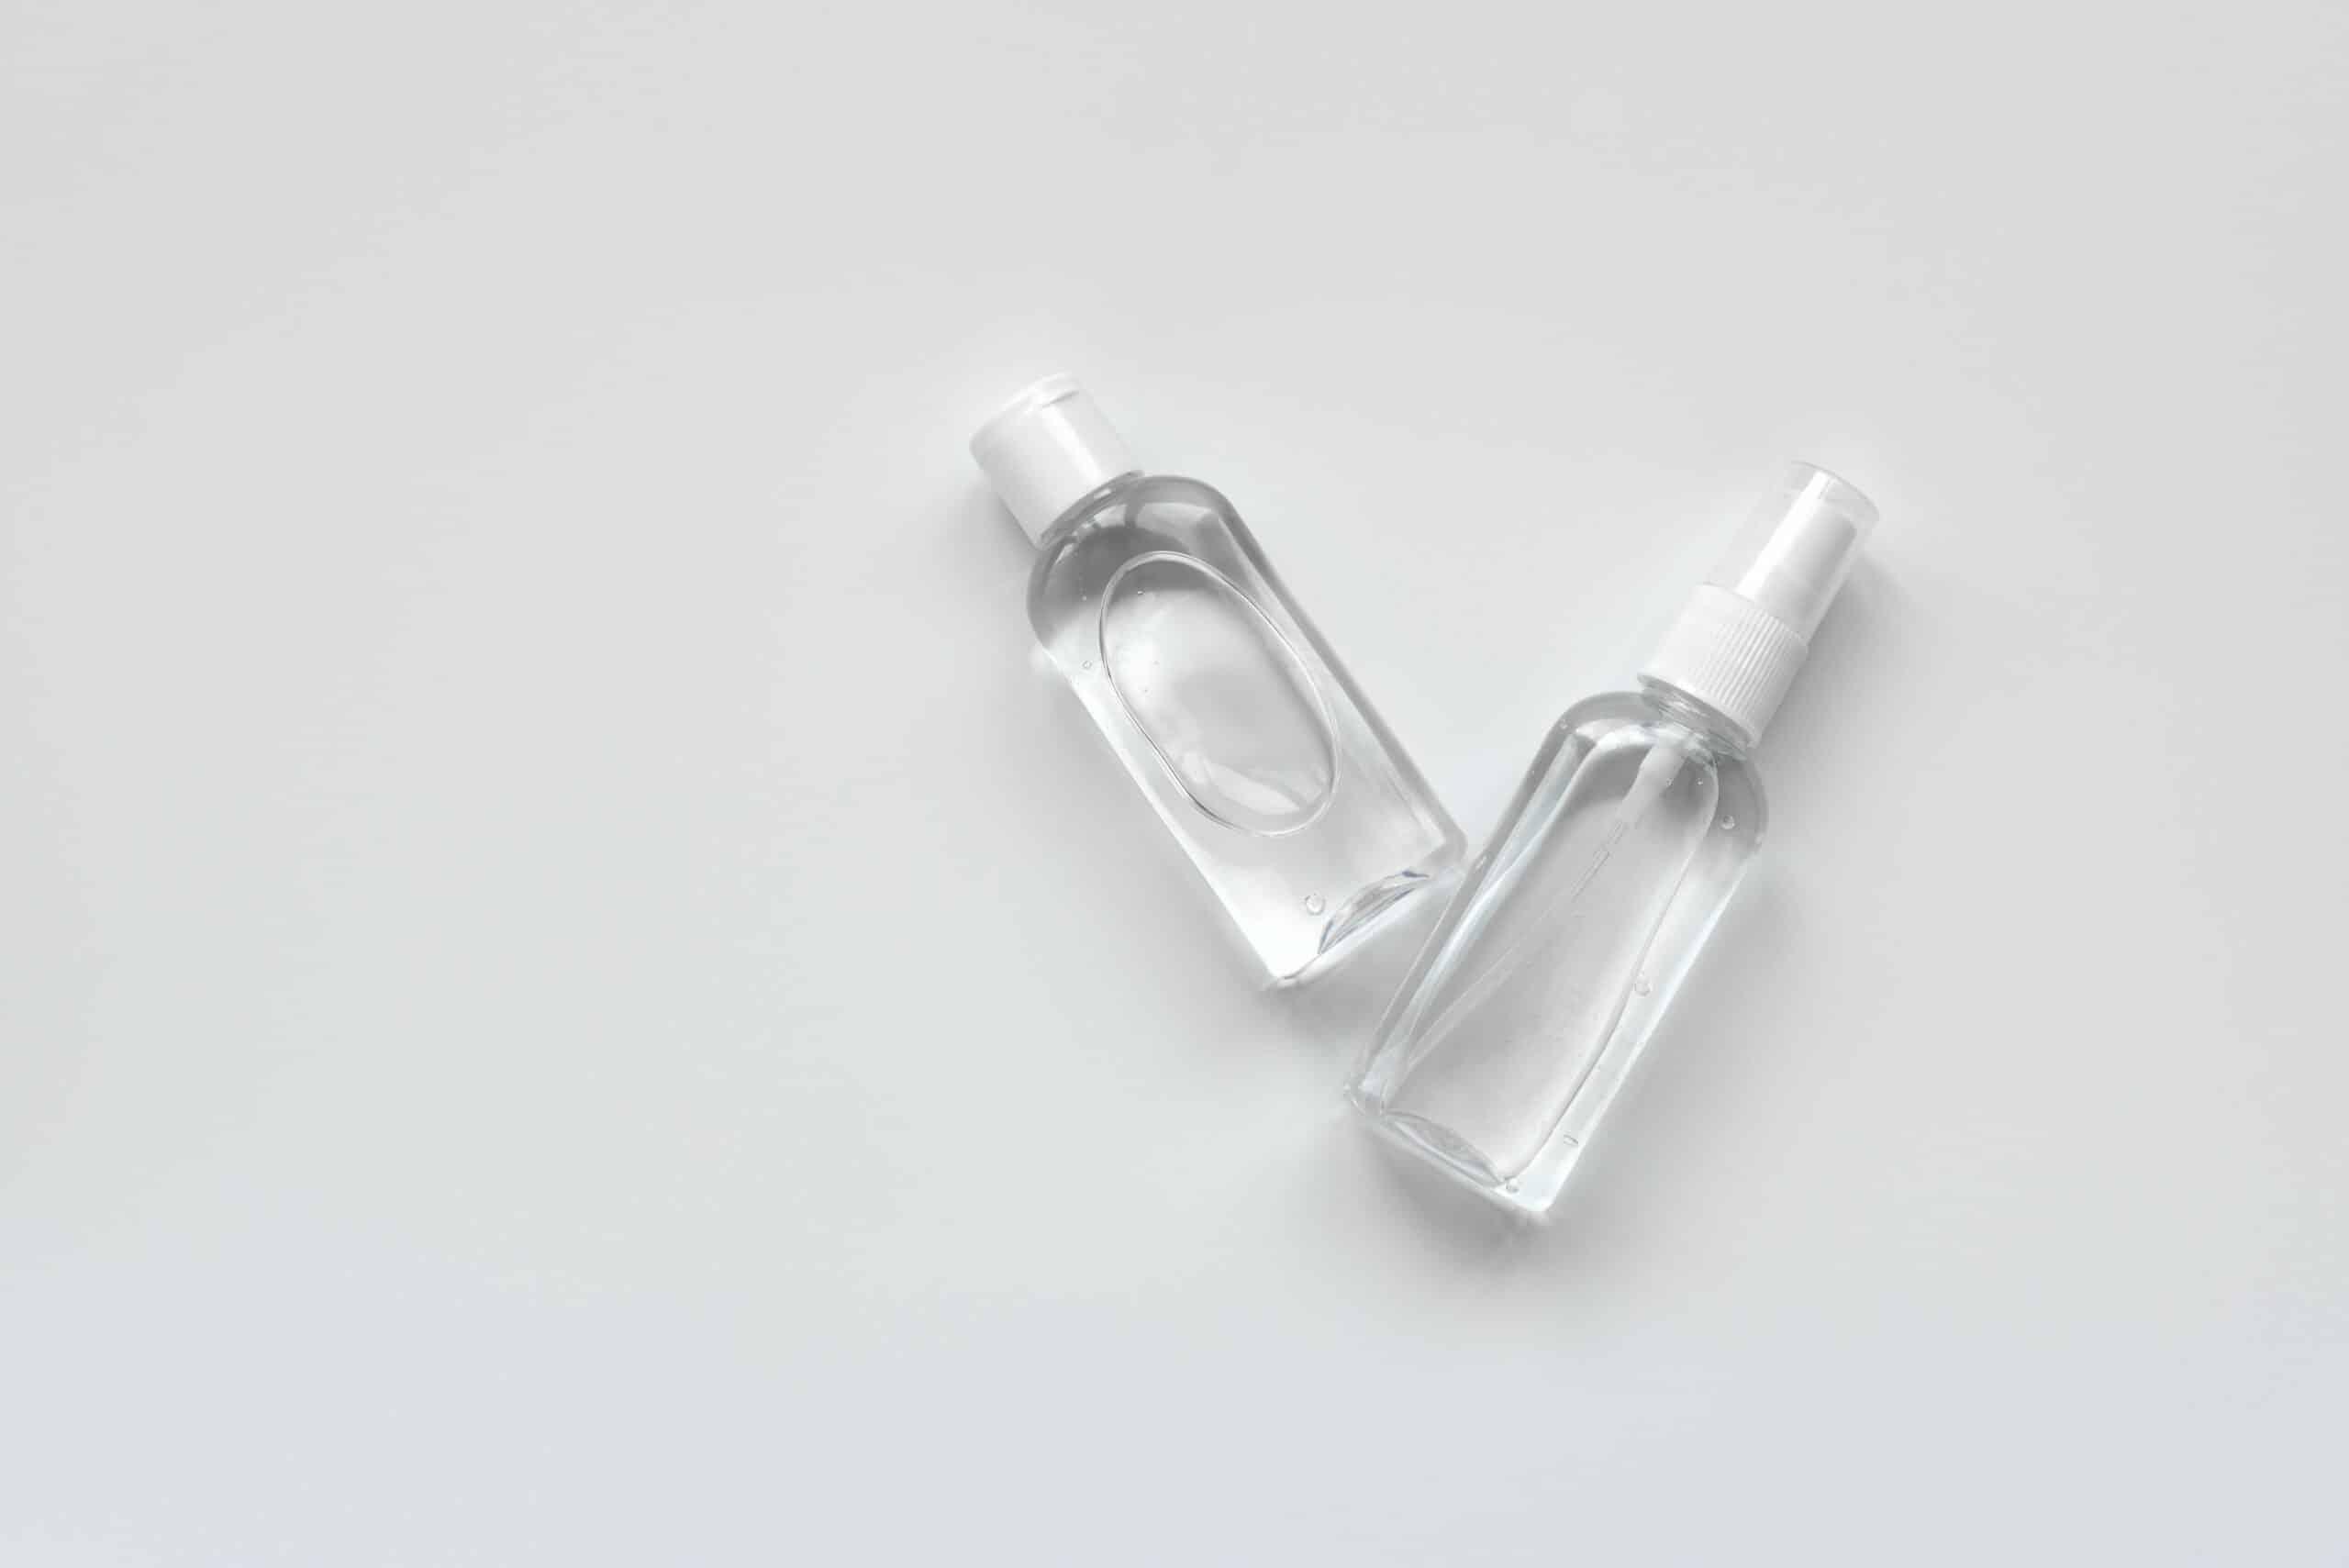 etykiety wodoodporne